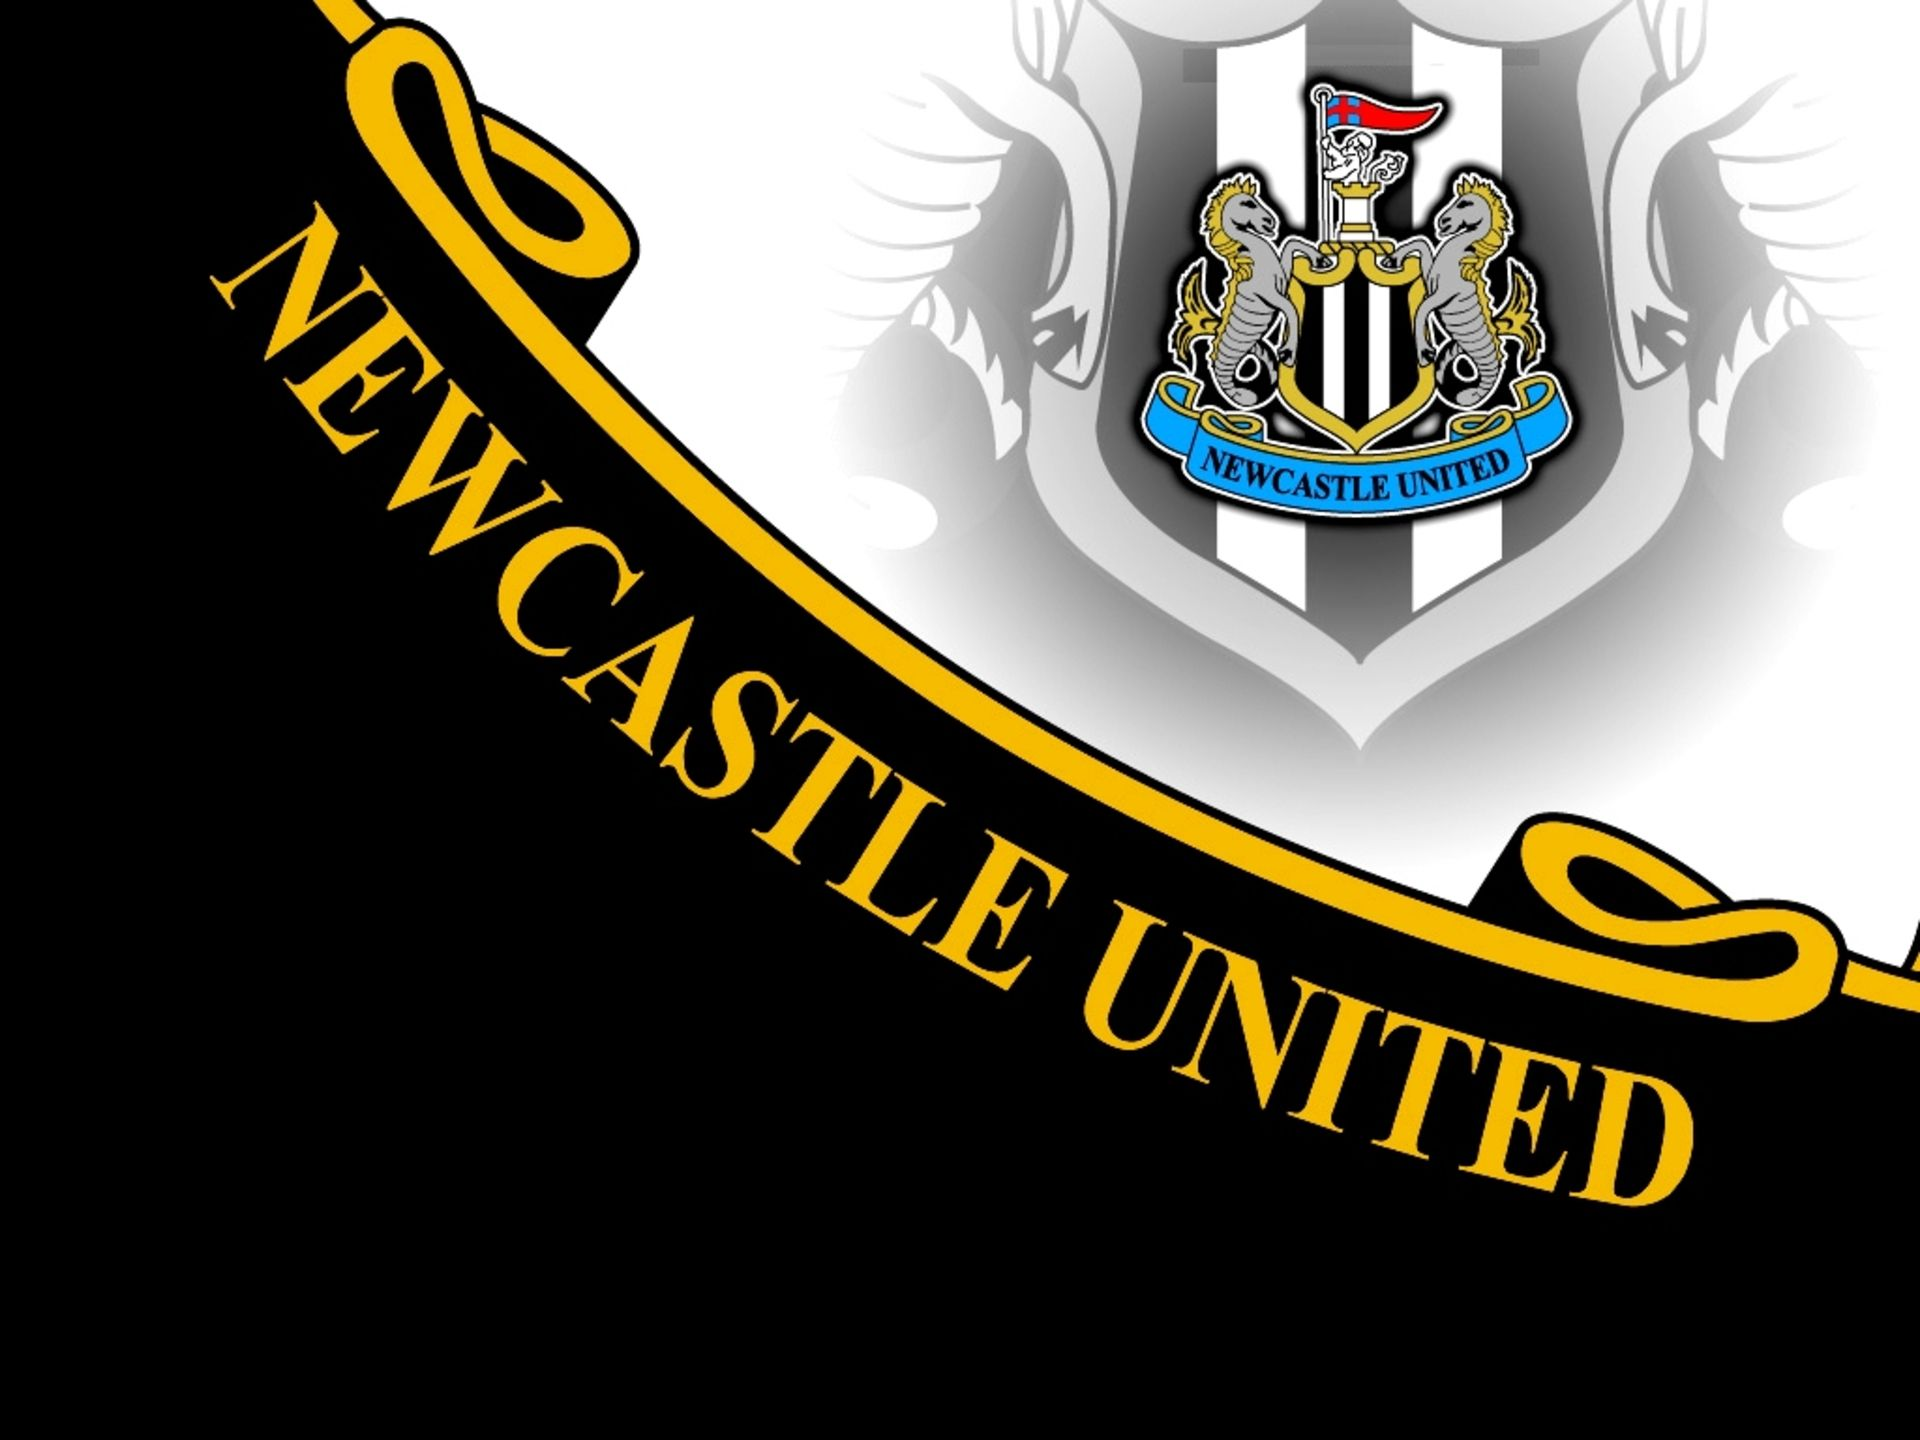 Newcastle United F C Wallpapers Wallpapersin4k Net